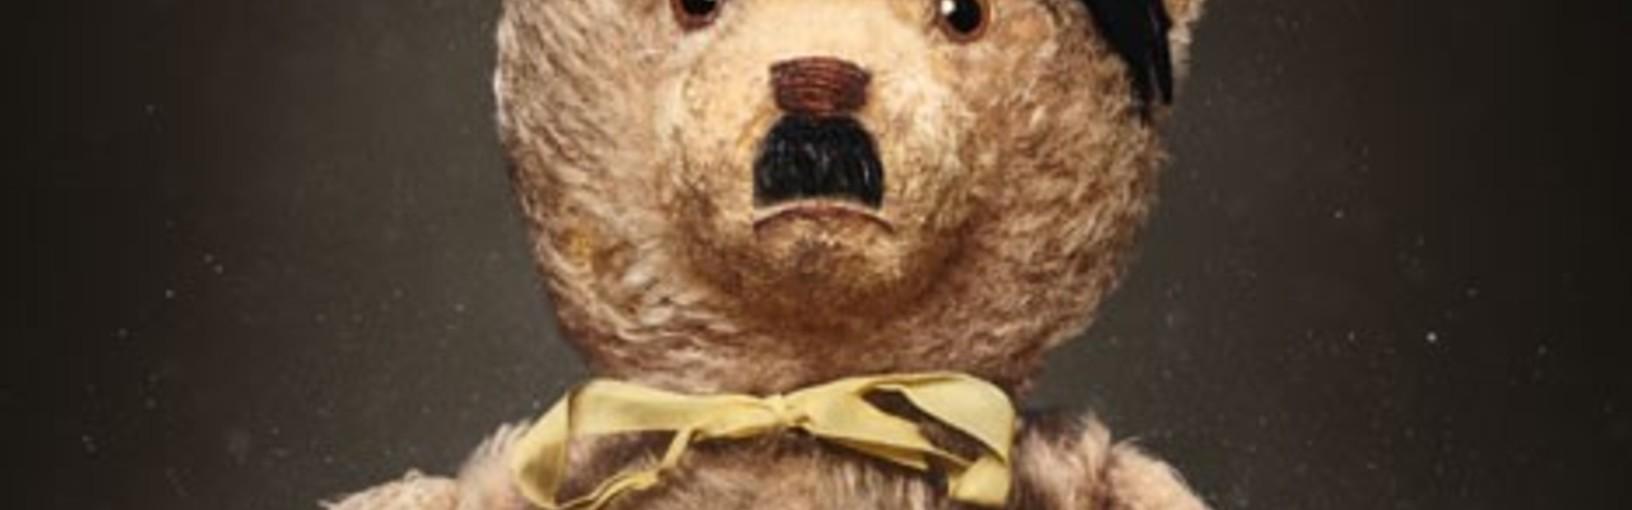 Scary teddy hitler fill 1632x510